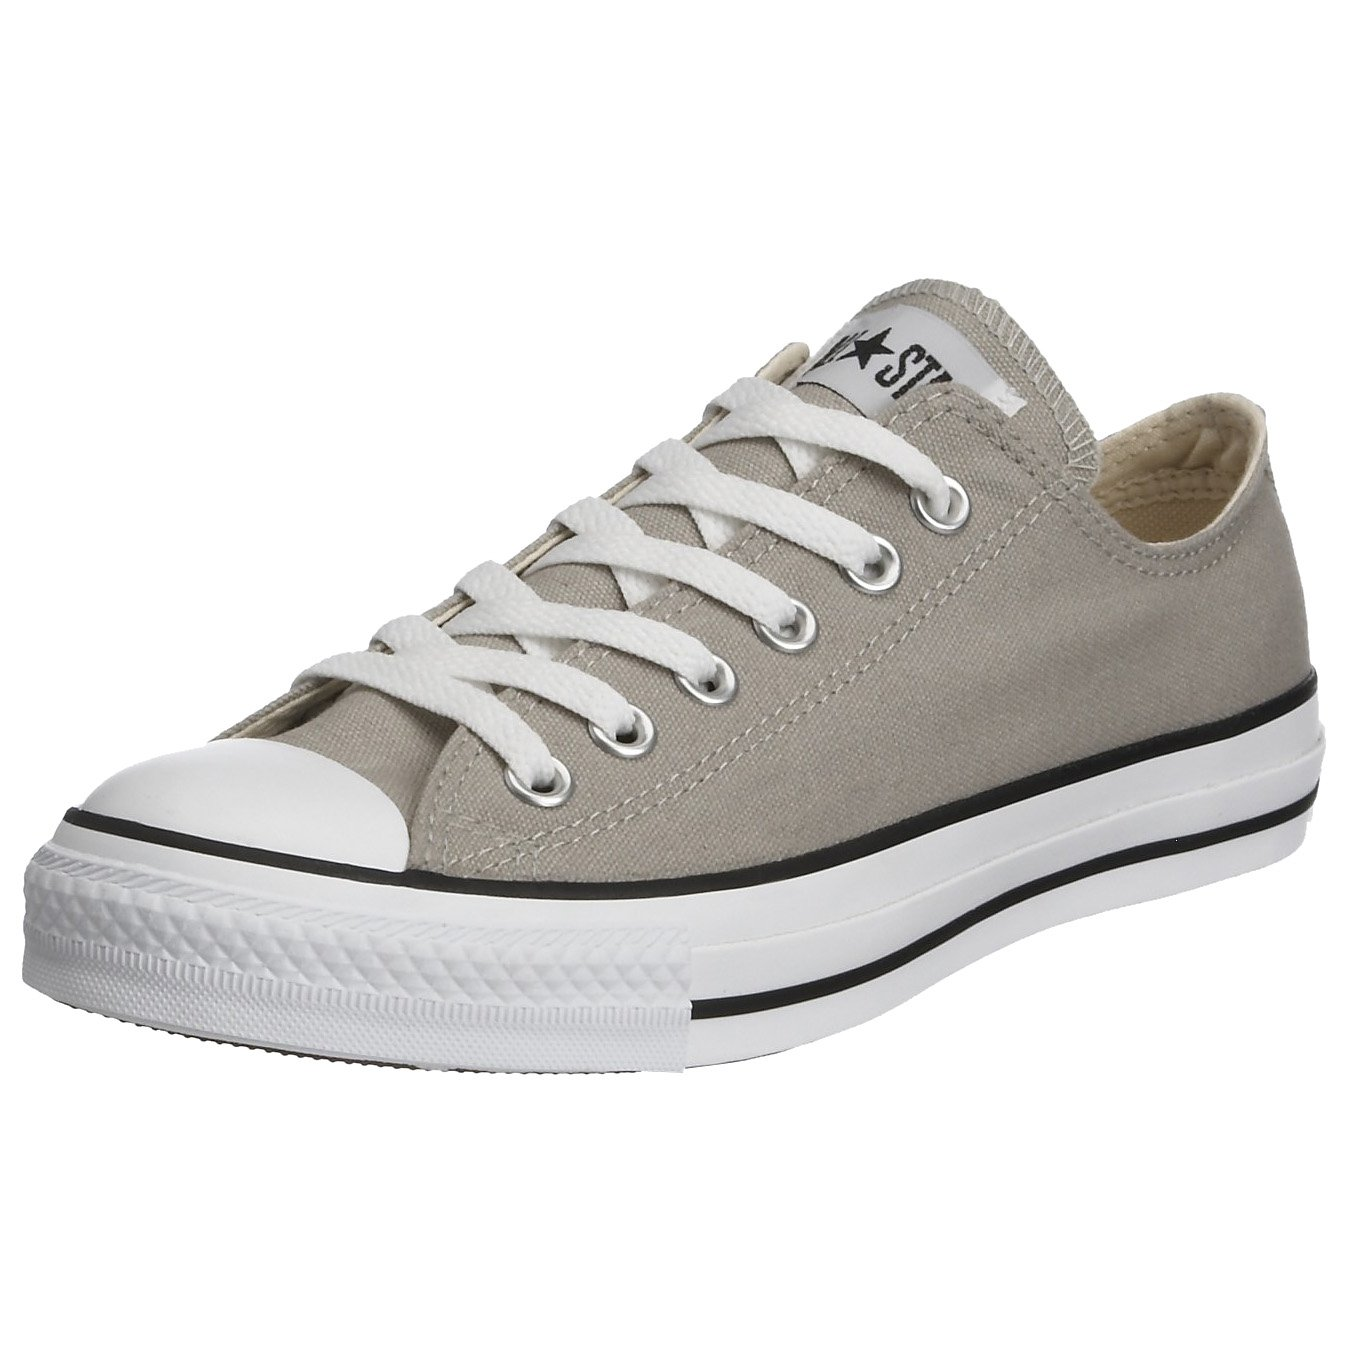 Converse Chuck Taylor All Star Season OX, Unisex Sneaker  12.5 Grau